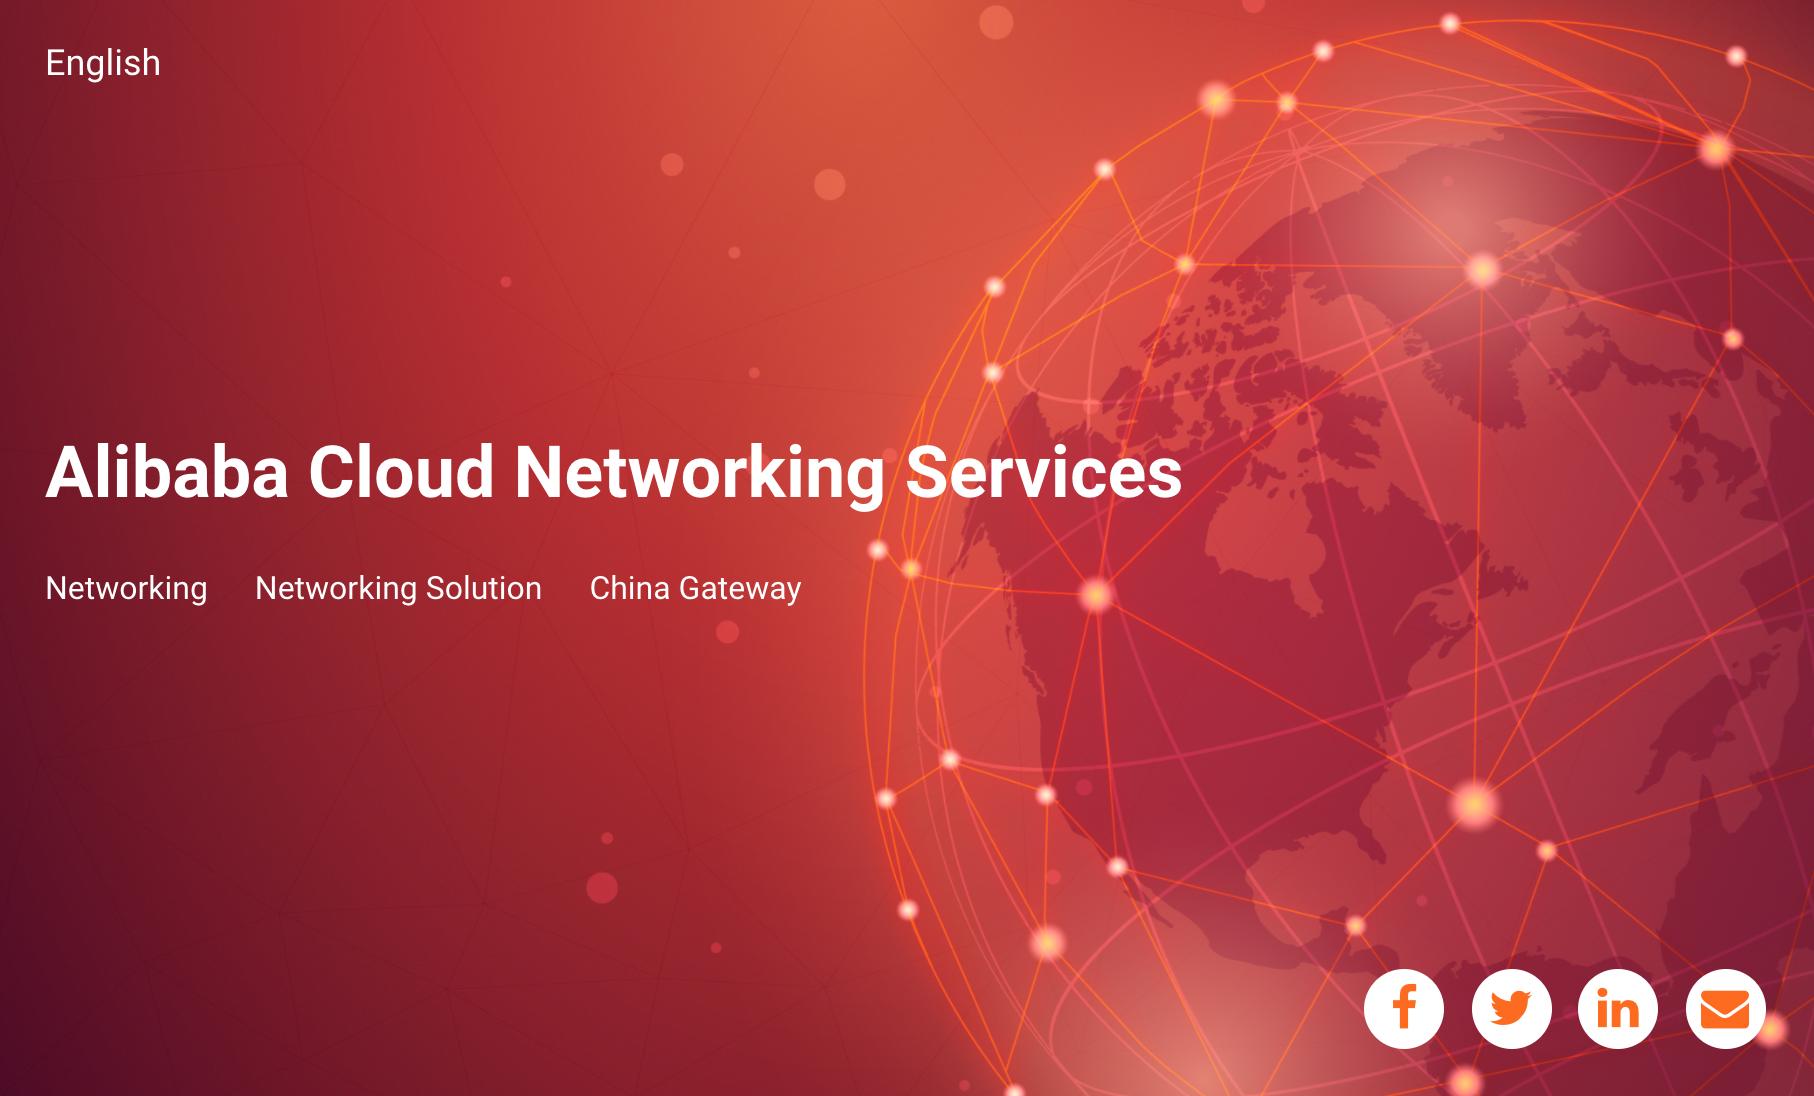 Alibaba Cloud Webinar: Alibaba Cloud Networking Services